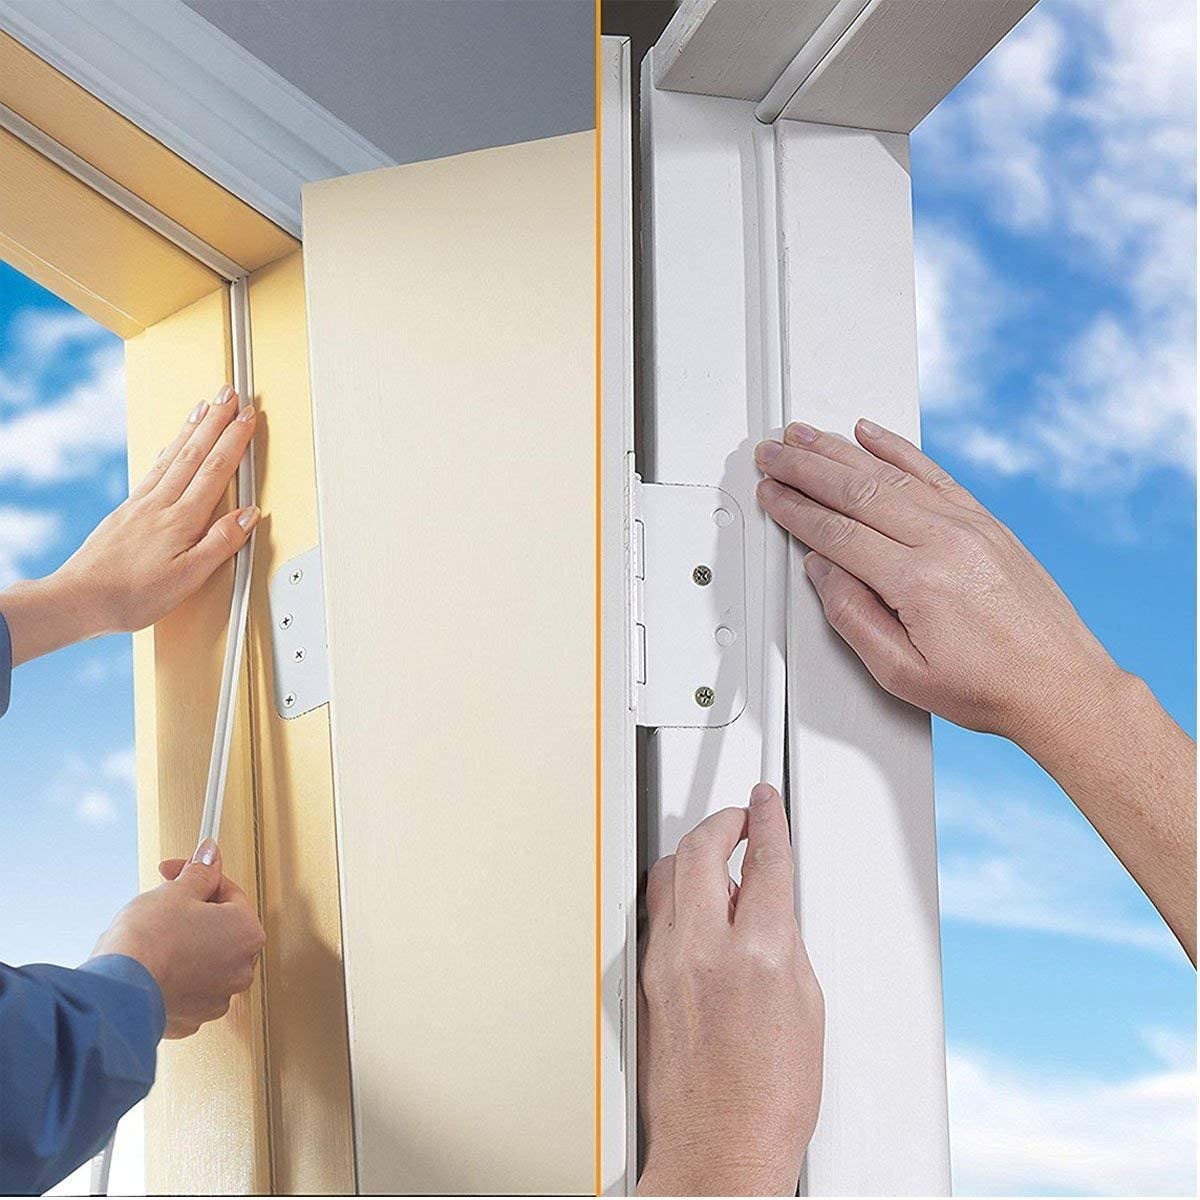 Window Door Foam Adhesive Strip Sealing Tape Adhesive Rubber Weather Strip HC